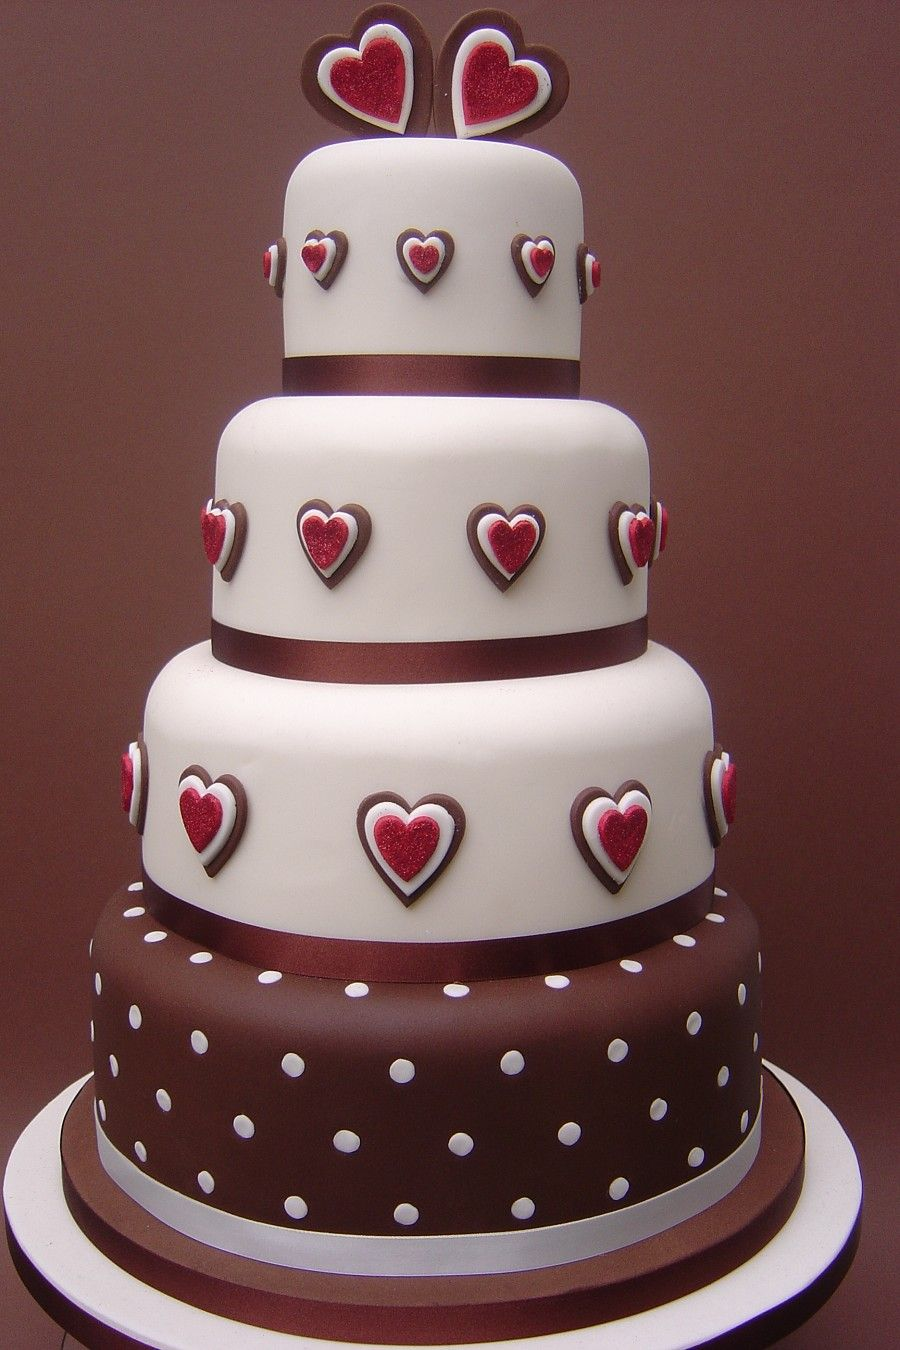 Red wedding cake designs wedding cake ideas collection smiles